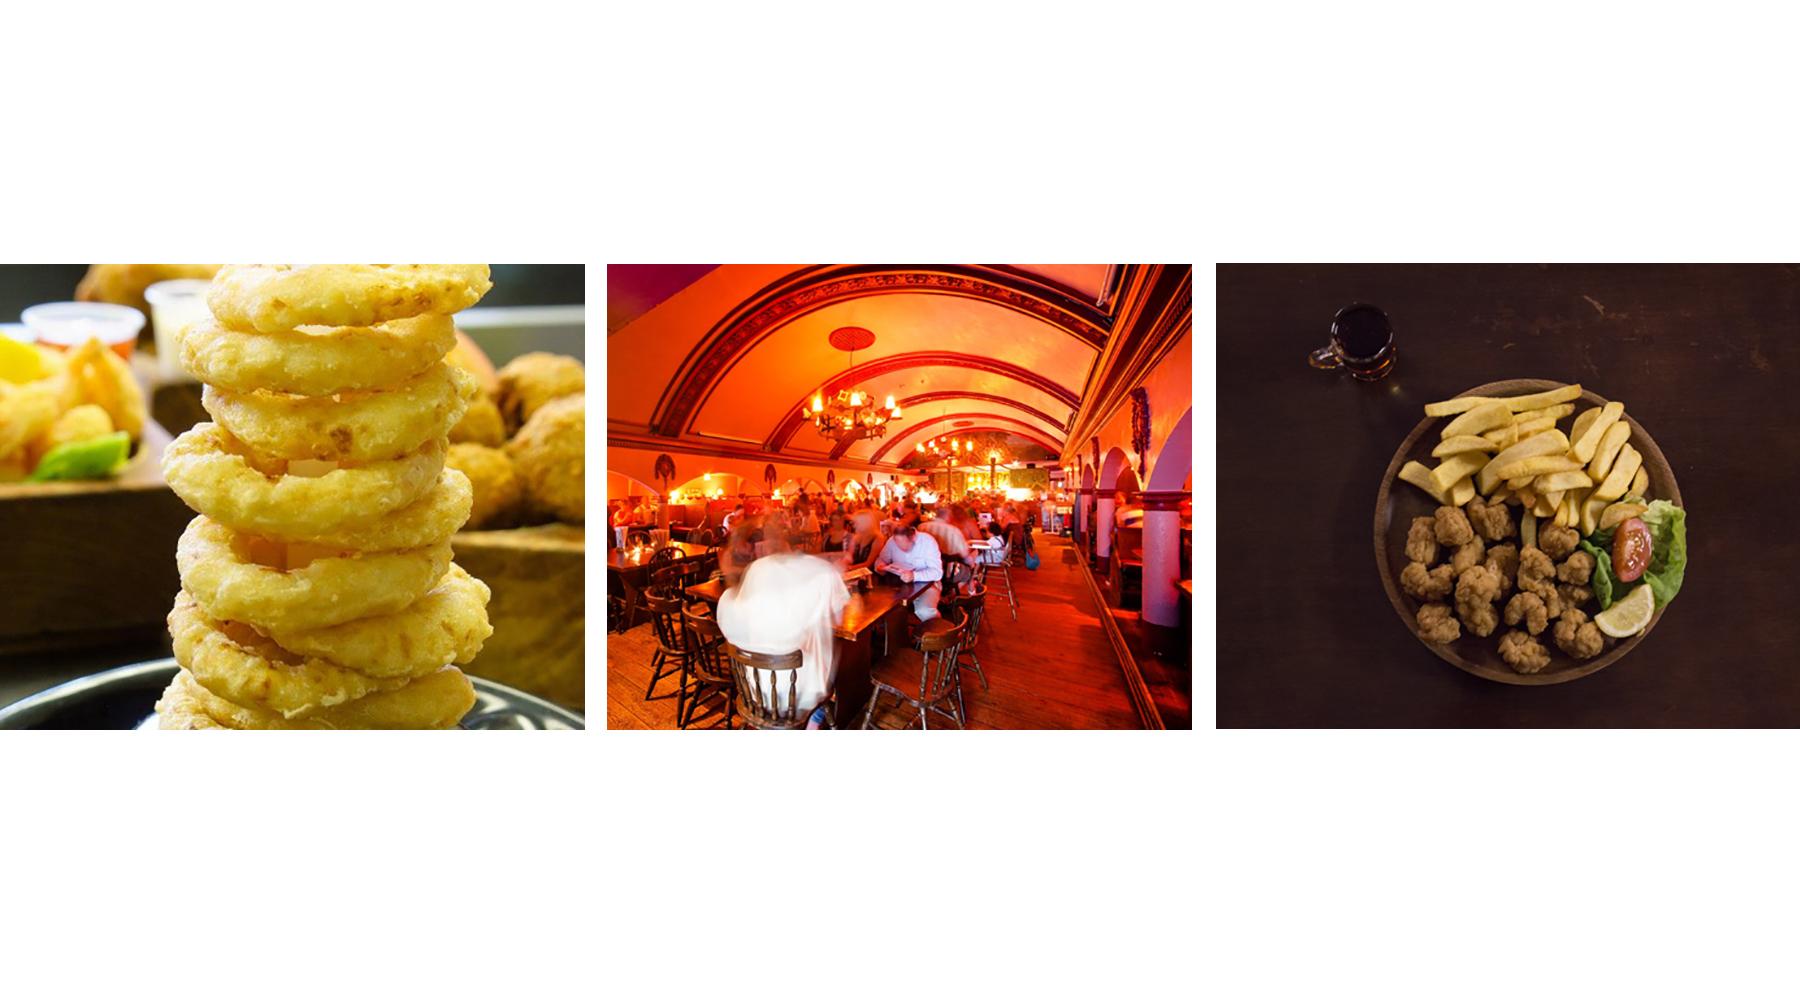 Newlyn Meadery | Medieval themed family restaurant in Newlyn